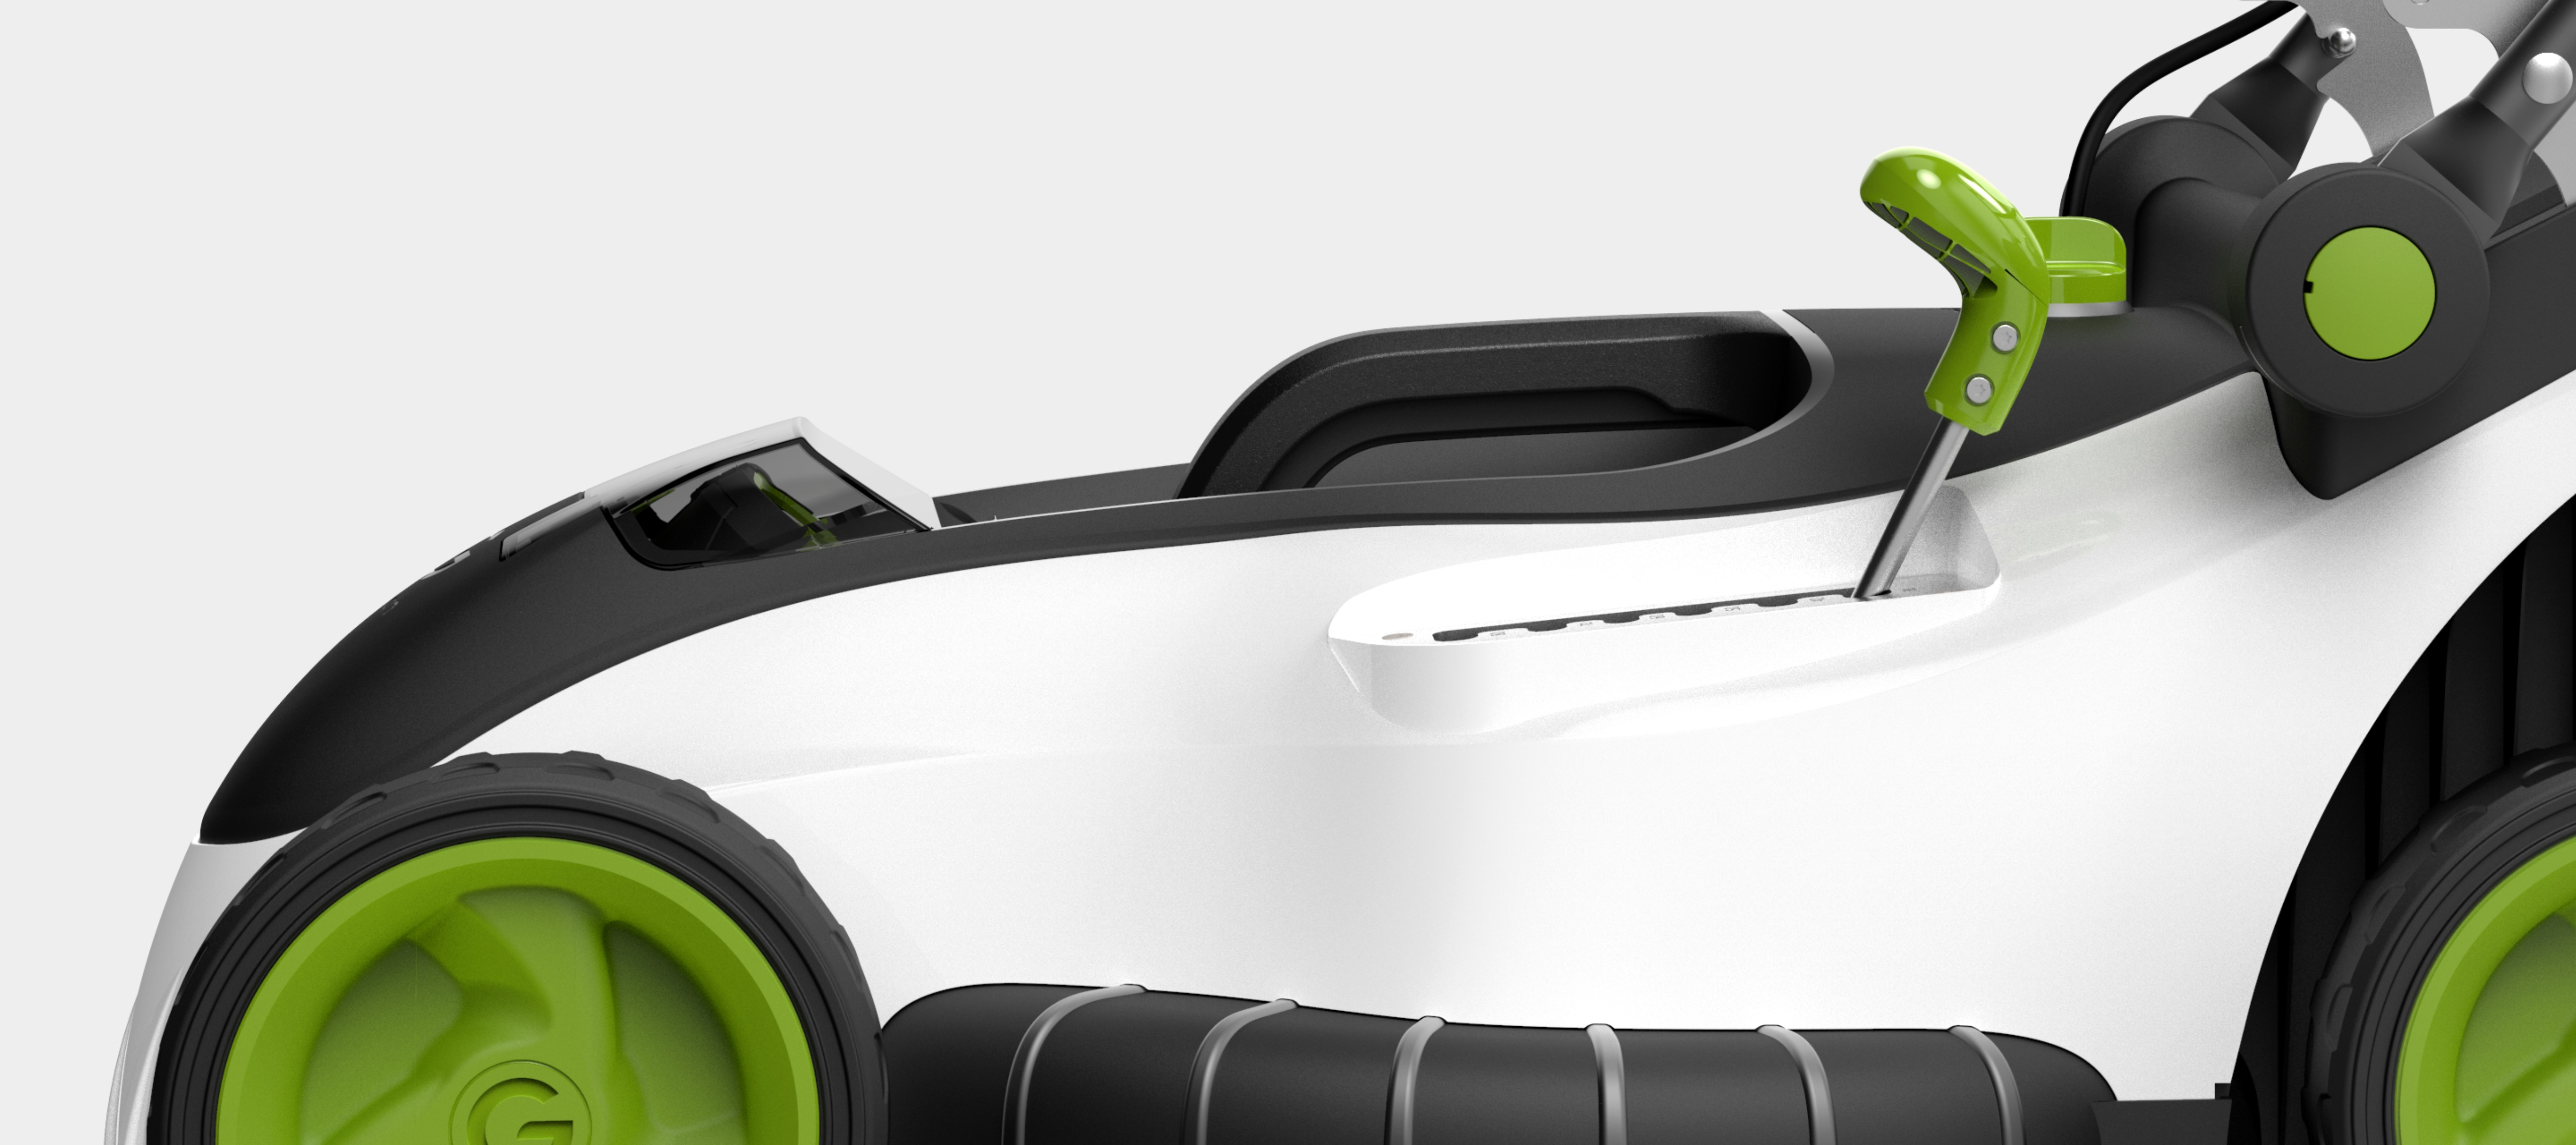 Battery powered mower high performance blade